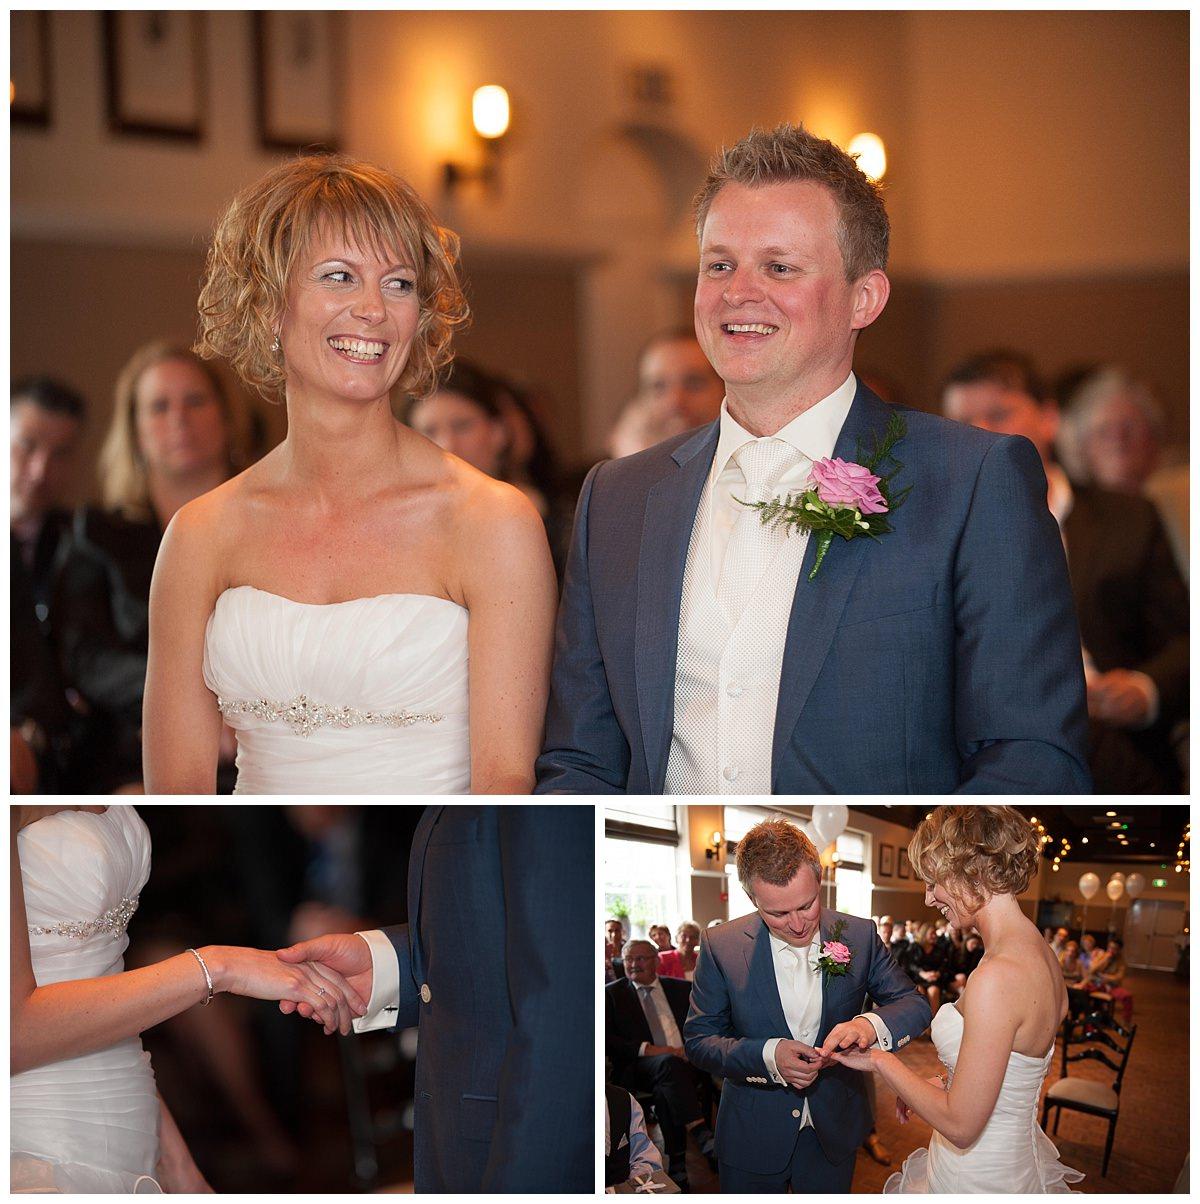 trouwshoot-bruidsfotografie-trouwfoto-feestfotografie-marcel en desiree-289.jpg